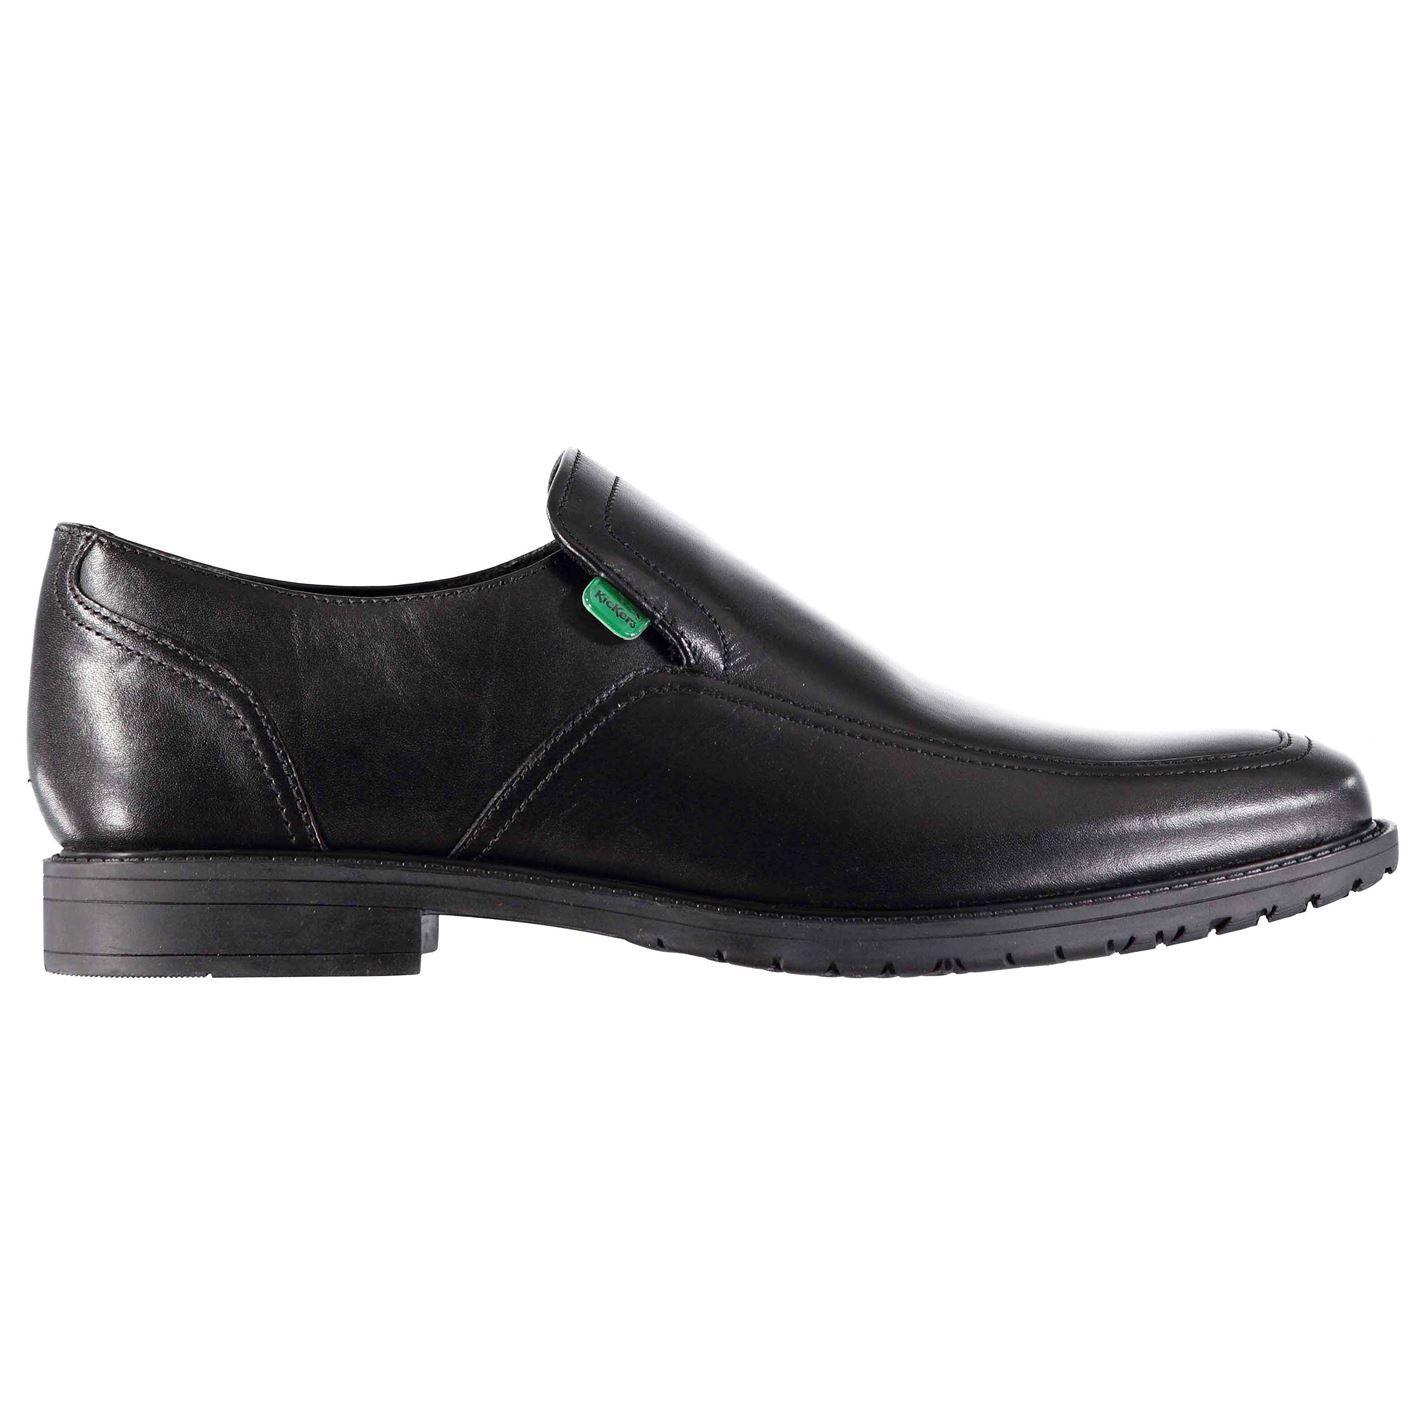 Kickers  Uomo Chreston Slip On Heel Formal Schuhes Smart Slight Heel On New 4ab0fe